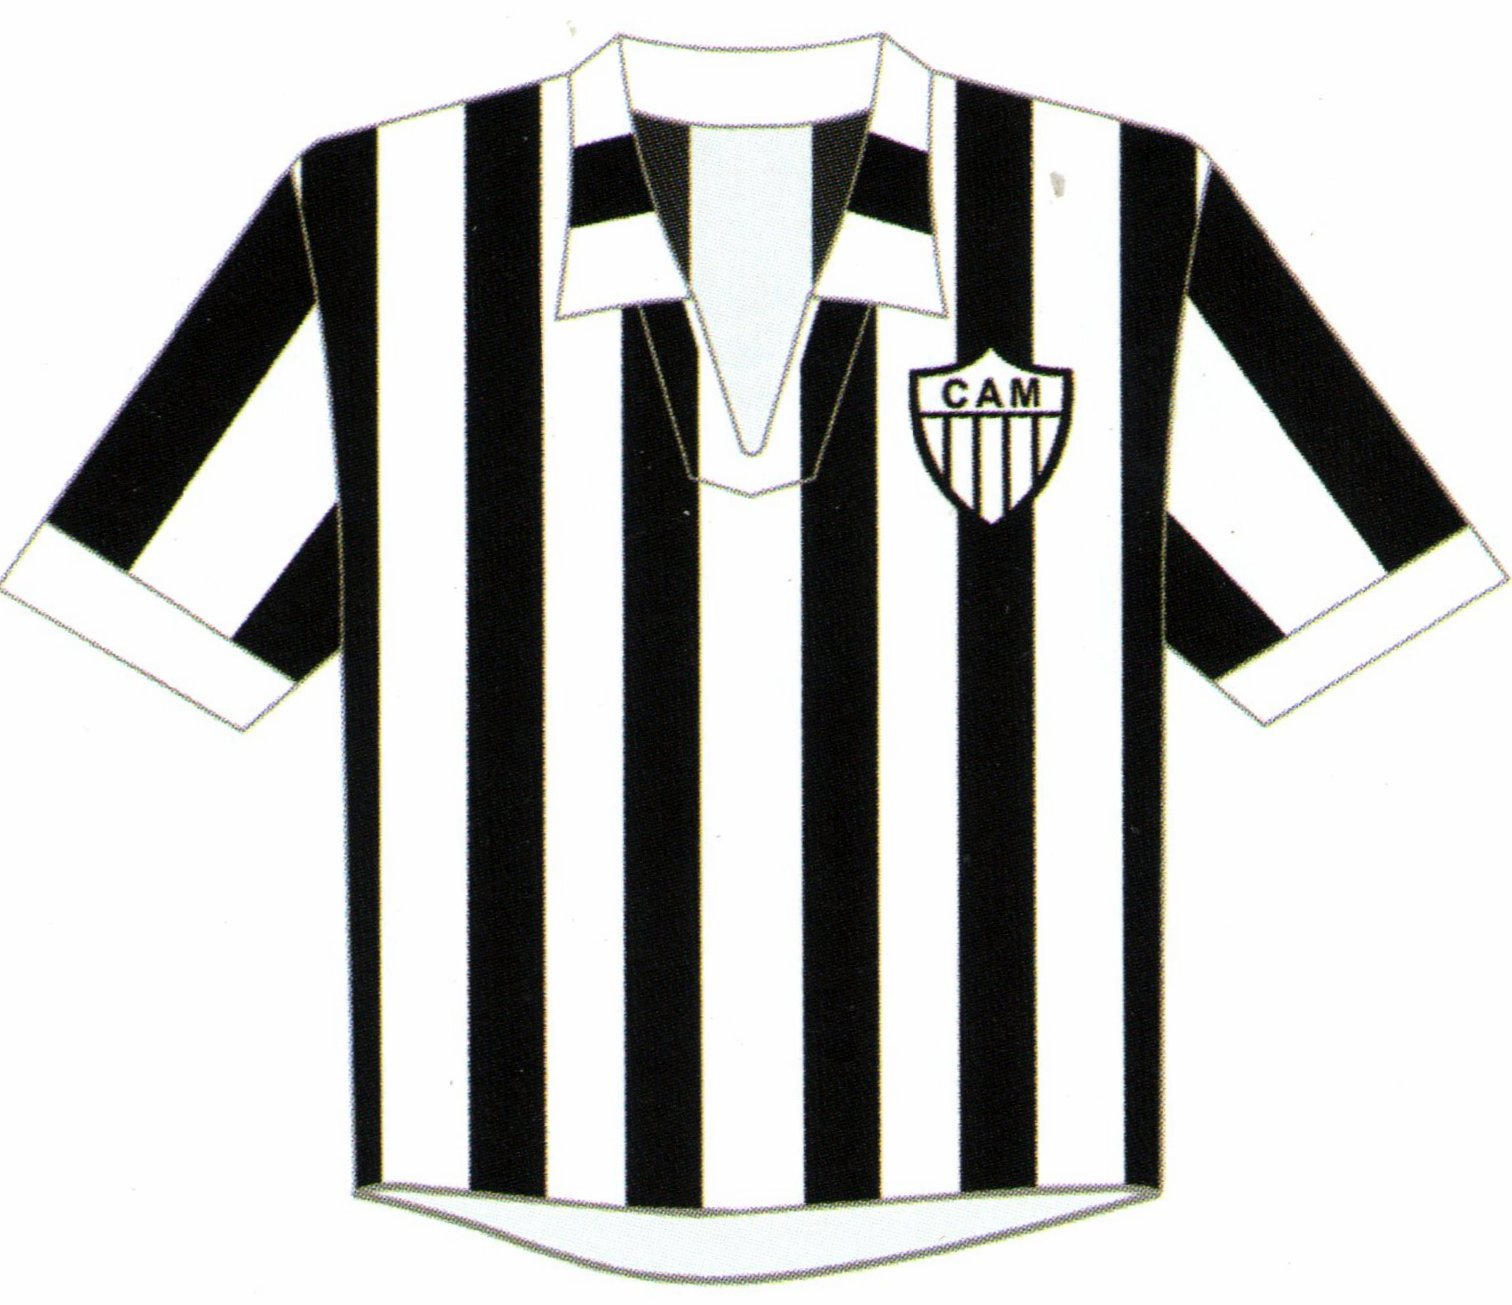 A Camisa Mais Bonita Na Historia Do Clube Atletico Mineiro 7ª Fase 1950 1959 Camisa Doze